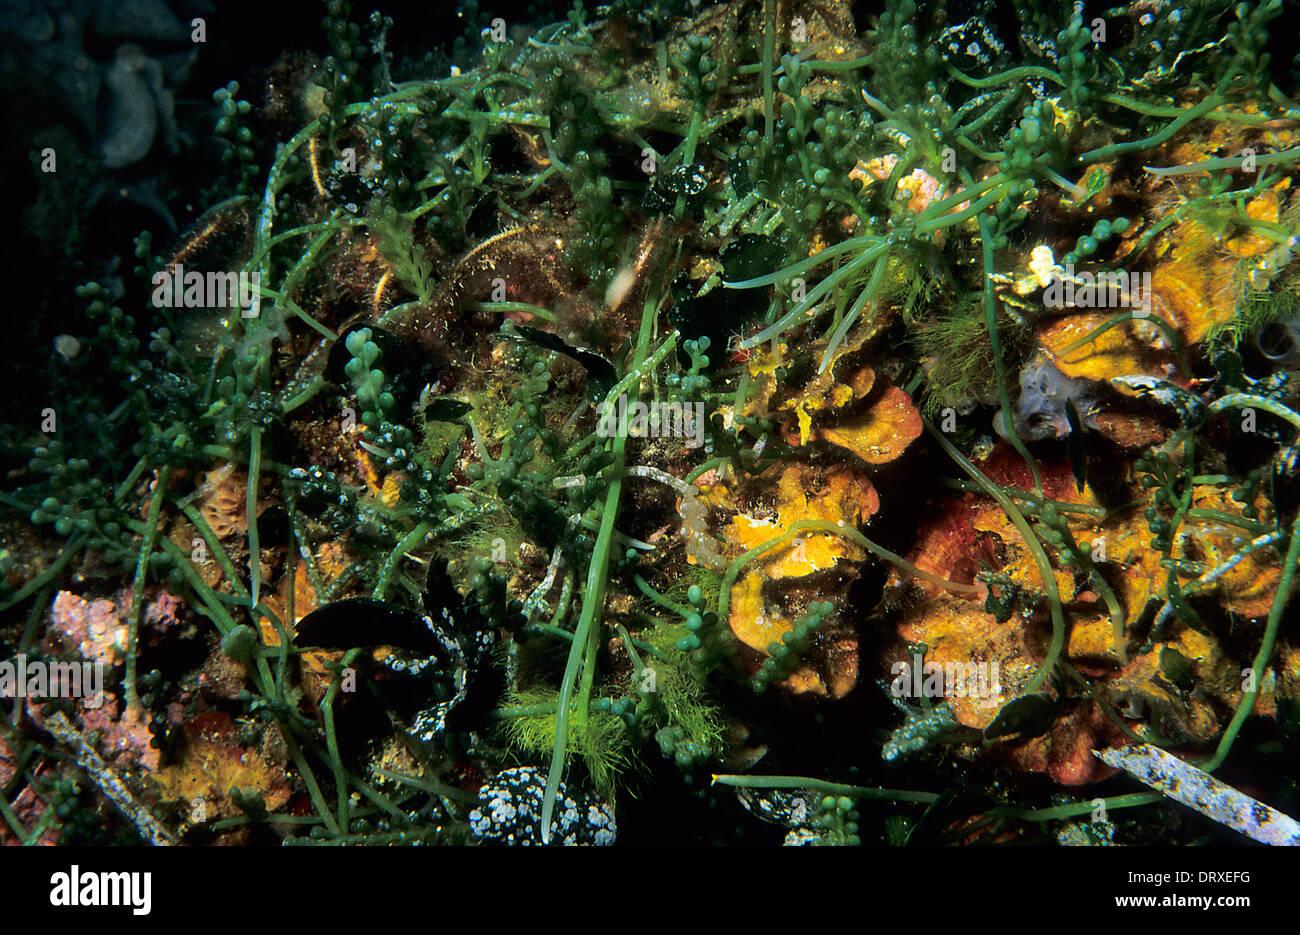 Allocton Invasive Seaweed Caulerpa racemosa var. cylindracea, Caulerpaceae, Capraia Island, Tuscany, Italy, Mediterranean Sea Stock Photo